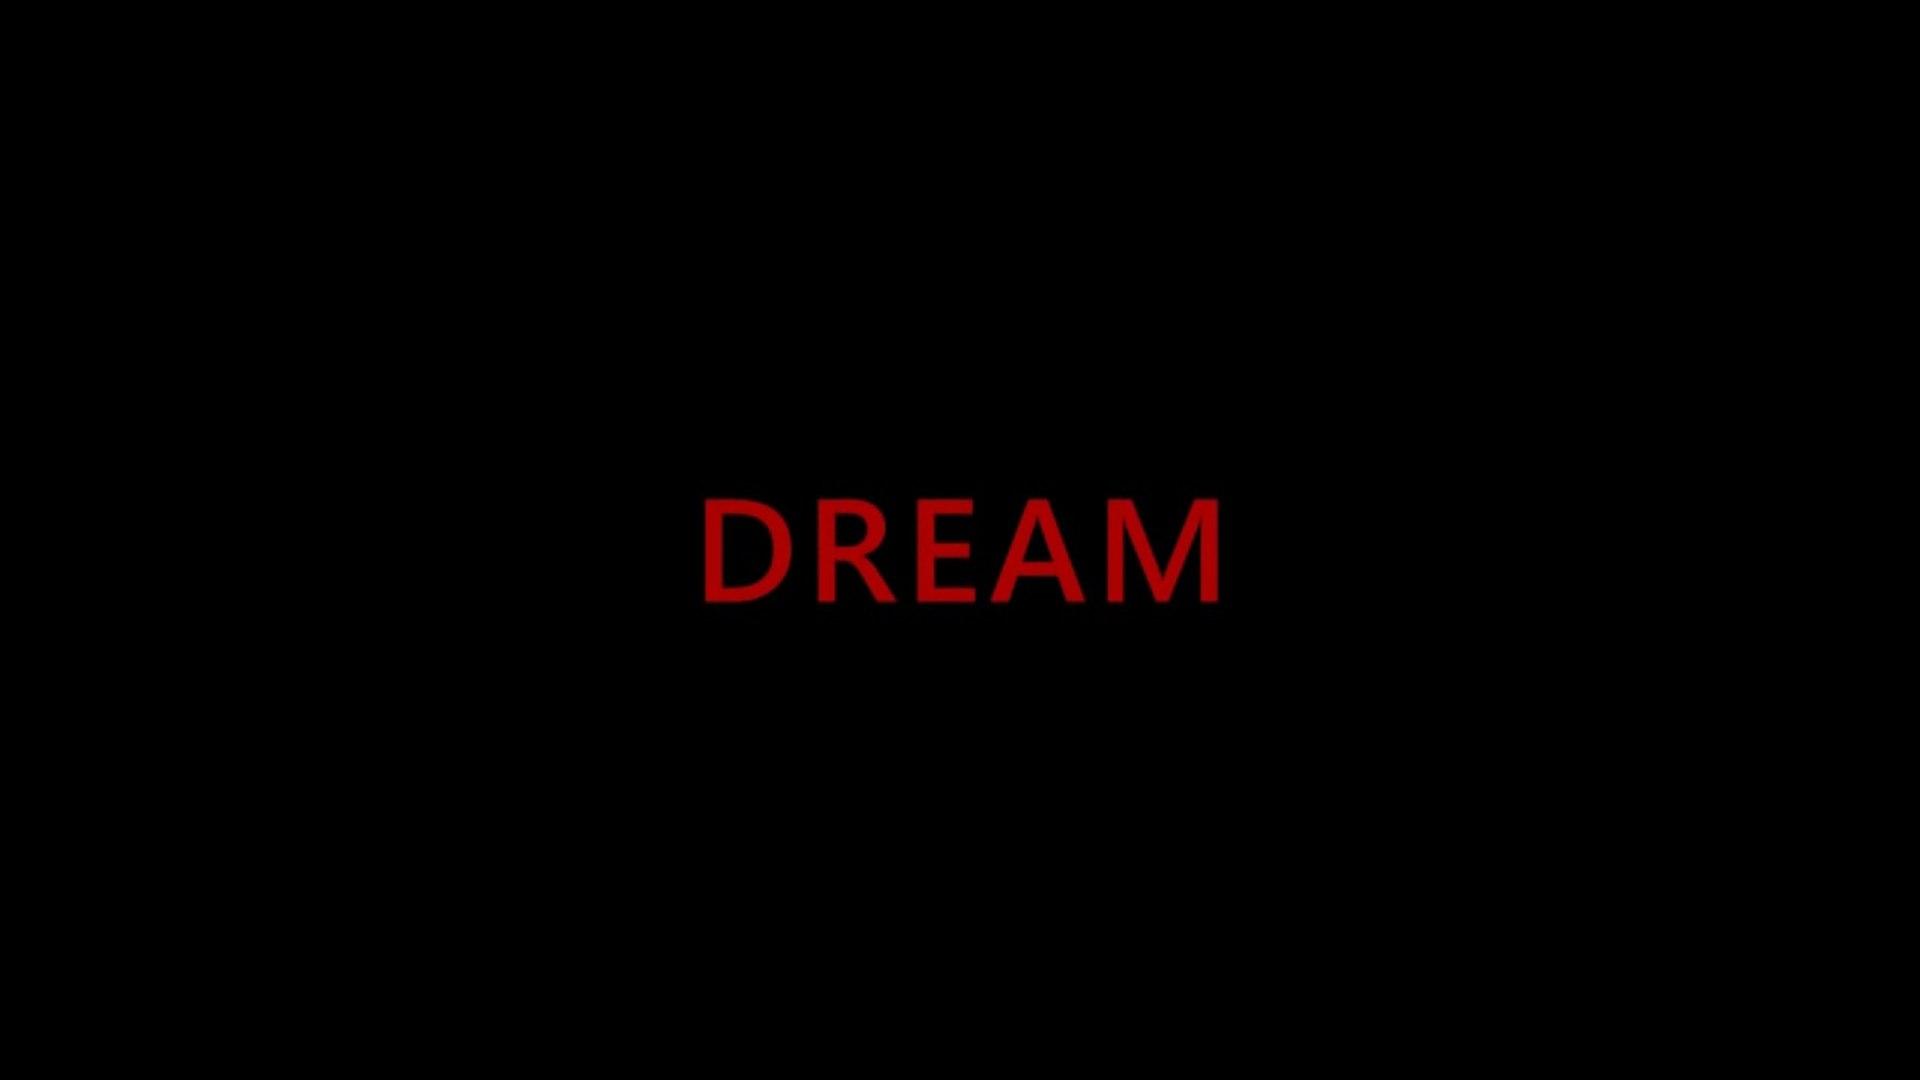 Motivational Video: Dream